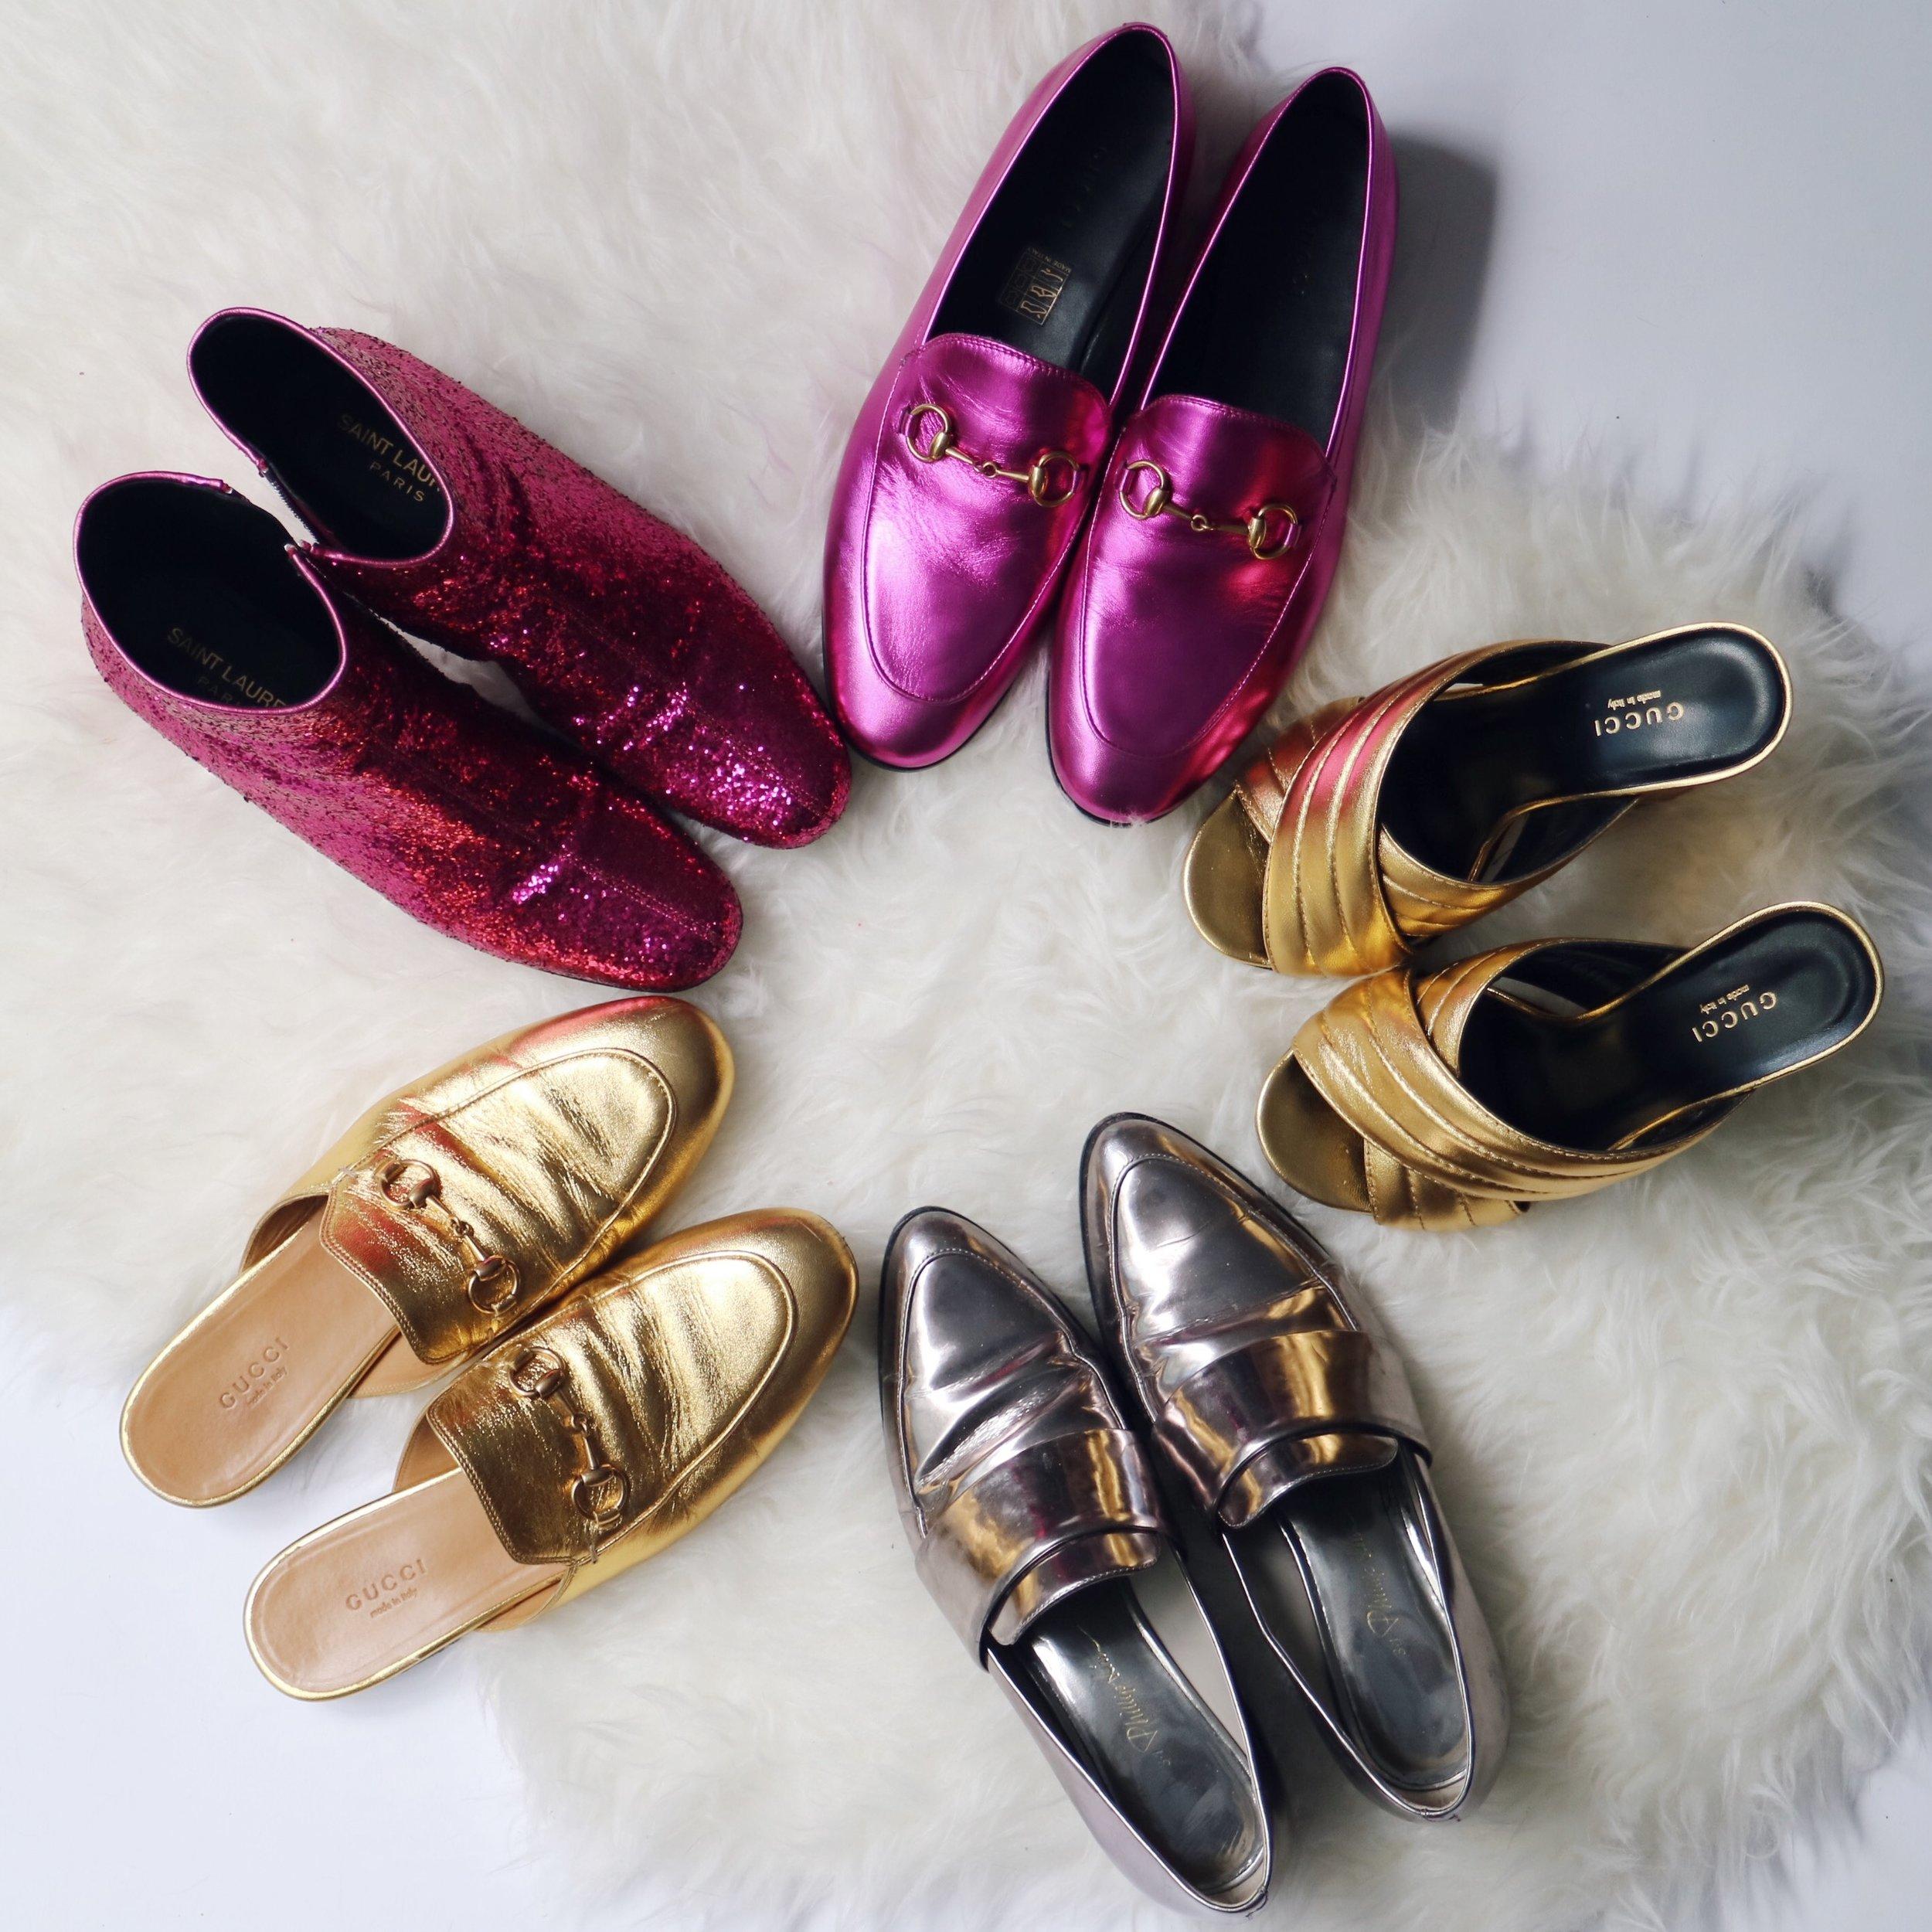 Gucci Shoe Haul and More - WoahStyle.com_0694.JPG